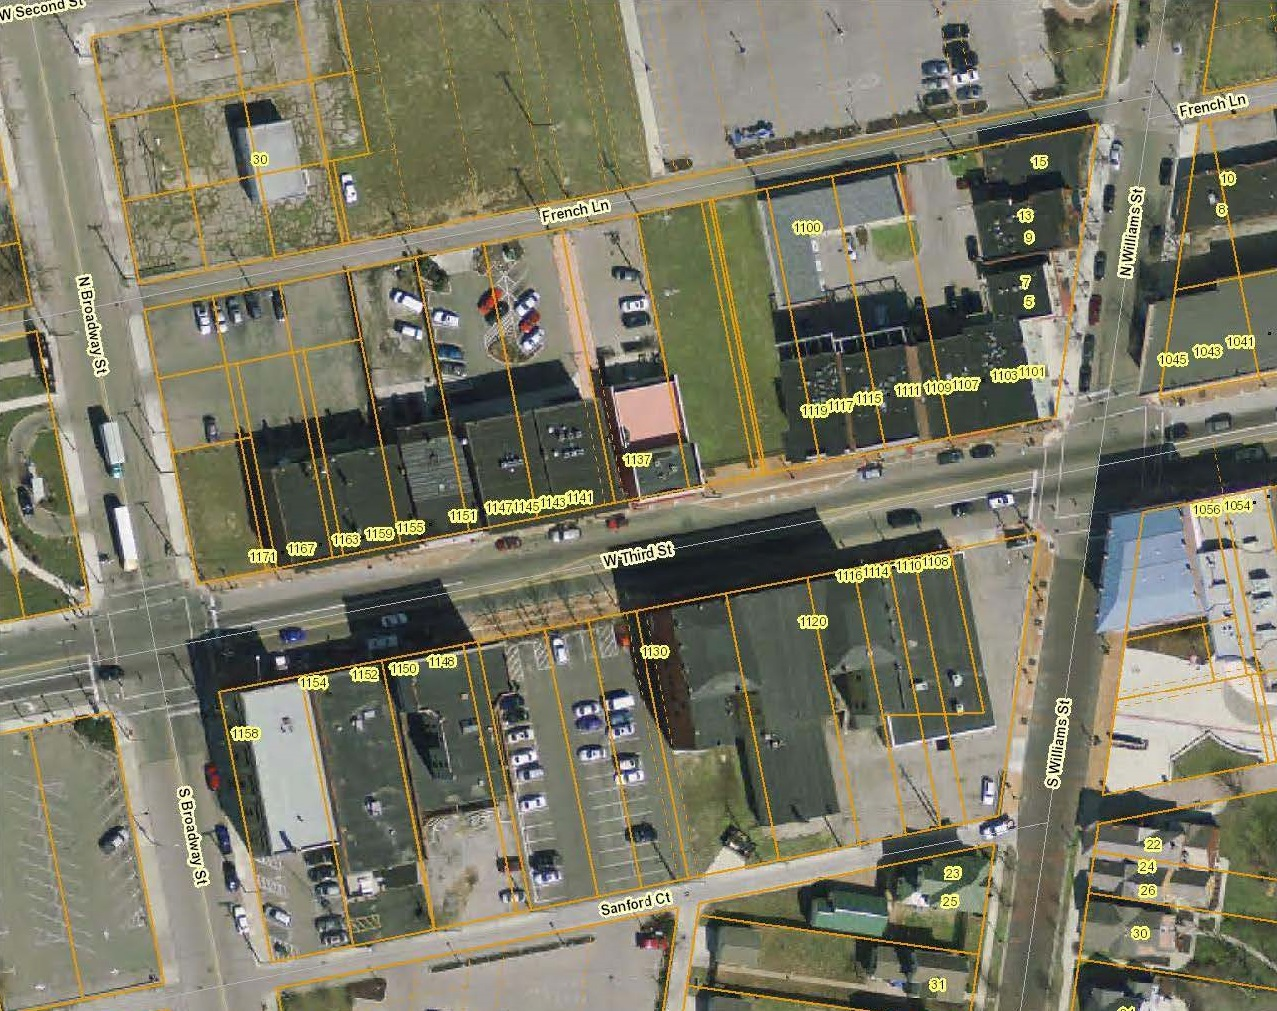 Wright Brother GIS map Dayton Ohio